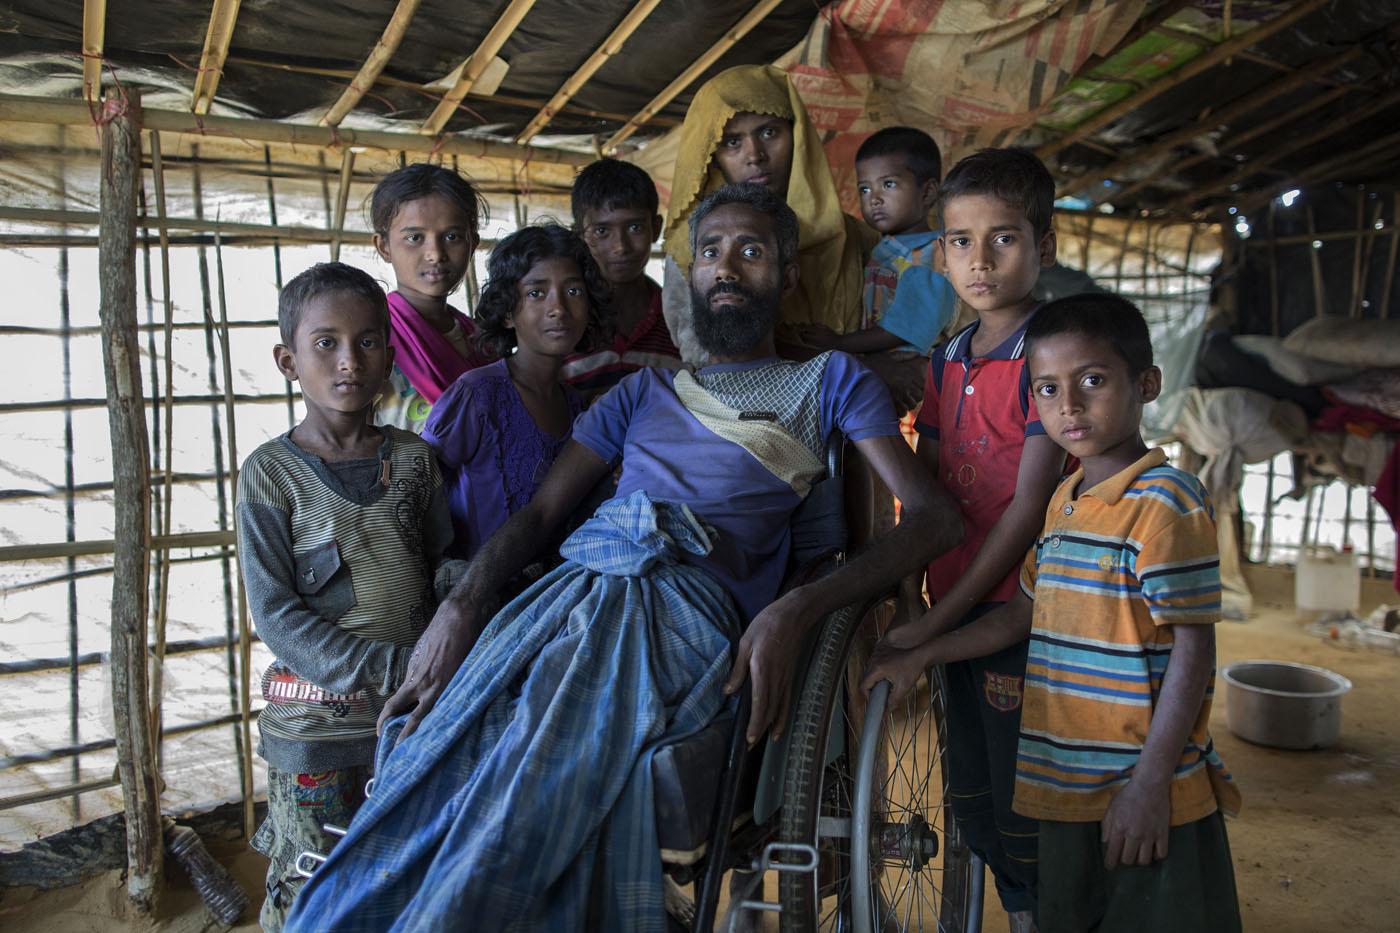 Probal Rashid_Bangladesh_The Rohingyas-A People Without A Home_02.jpg